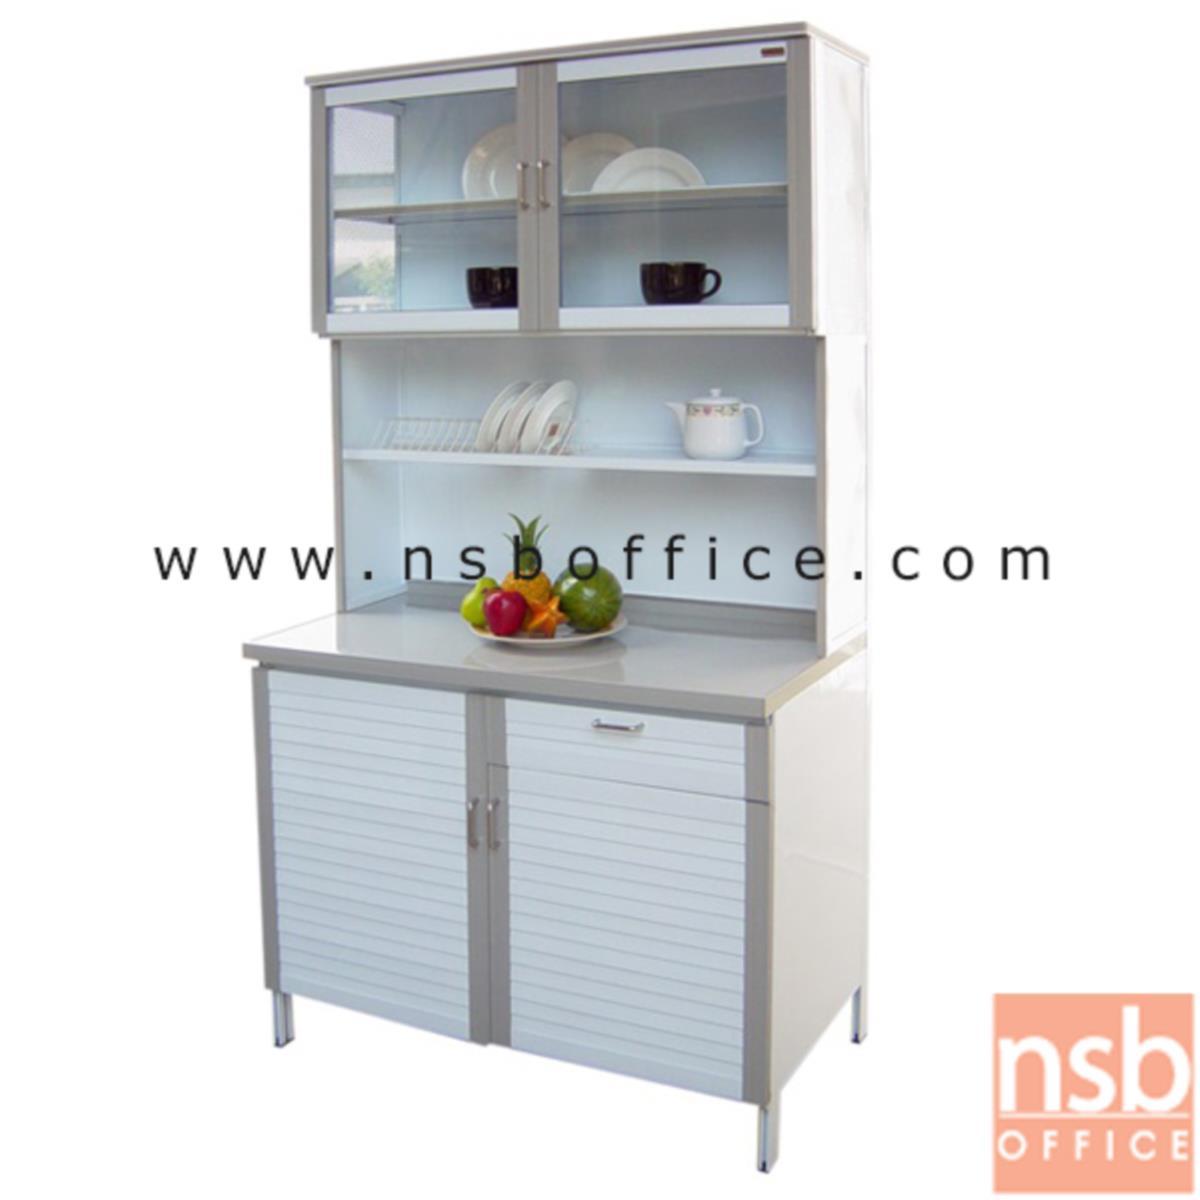 G07A079:ตู้ครัวบานเกล็ด 2 บานเปิดสูง สำหรับเก็บอาหาร  ขนาด 100W*54D*190H cm.